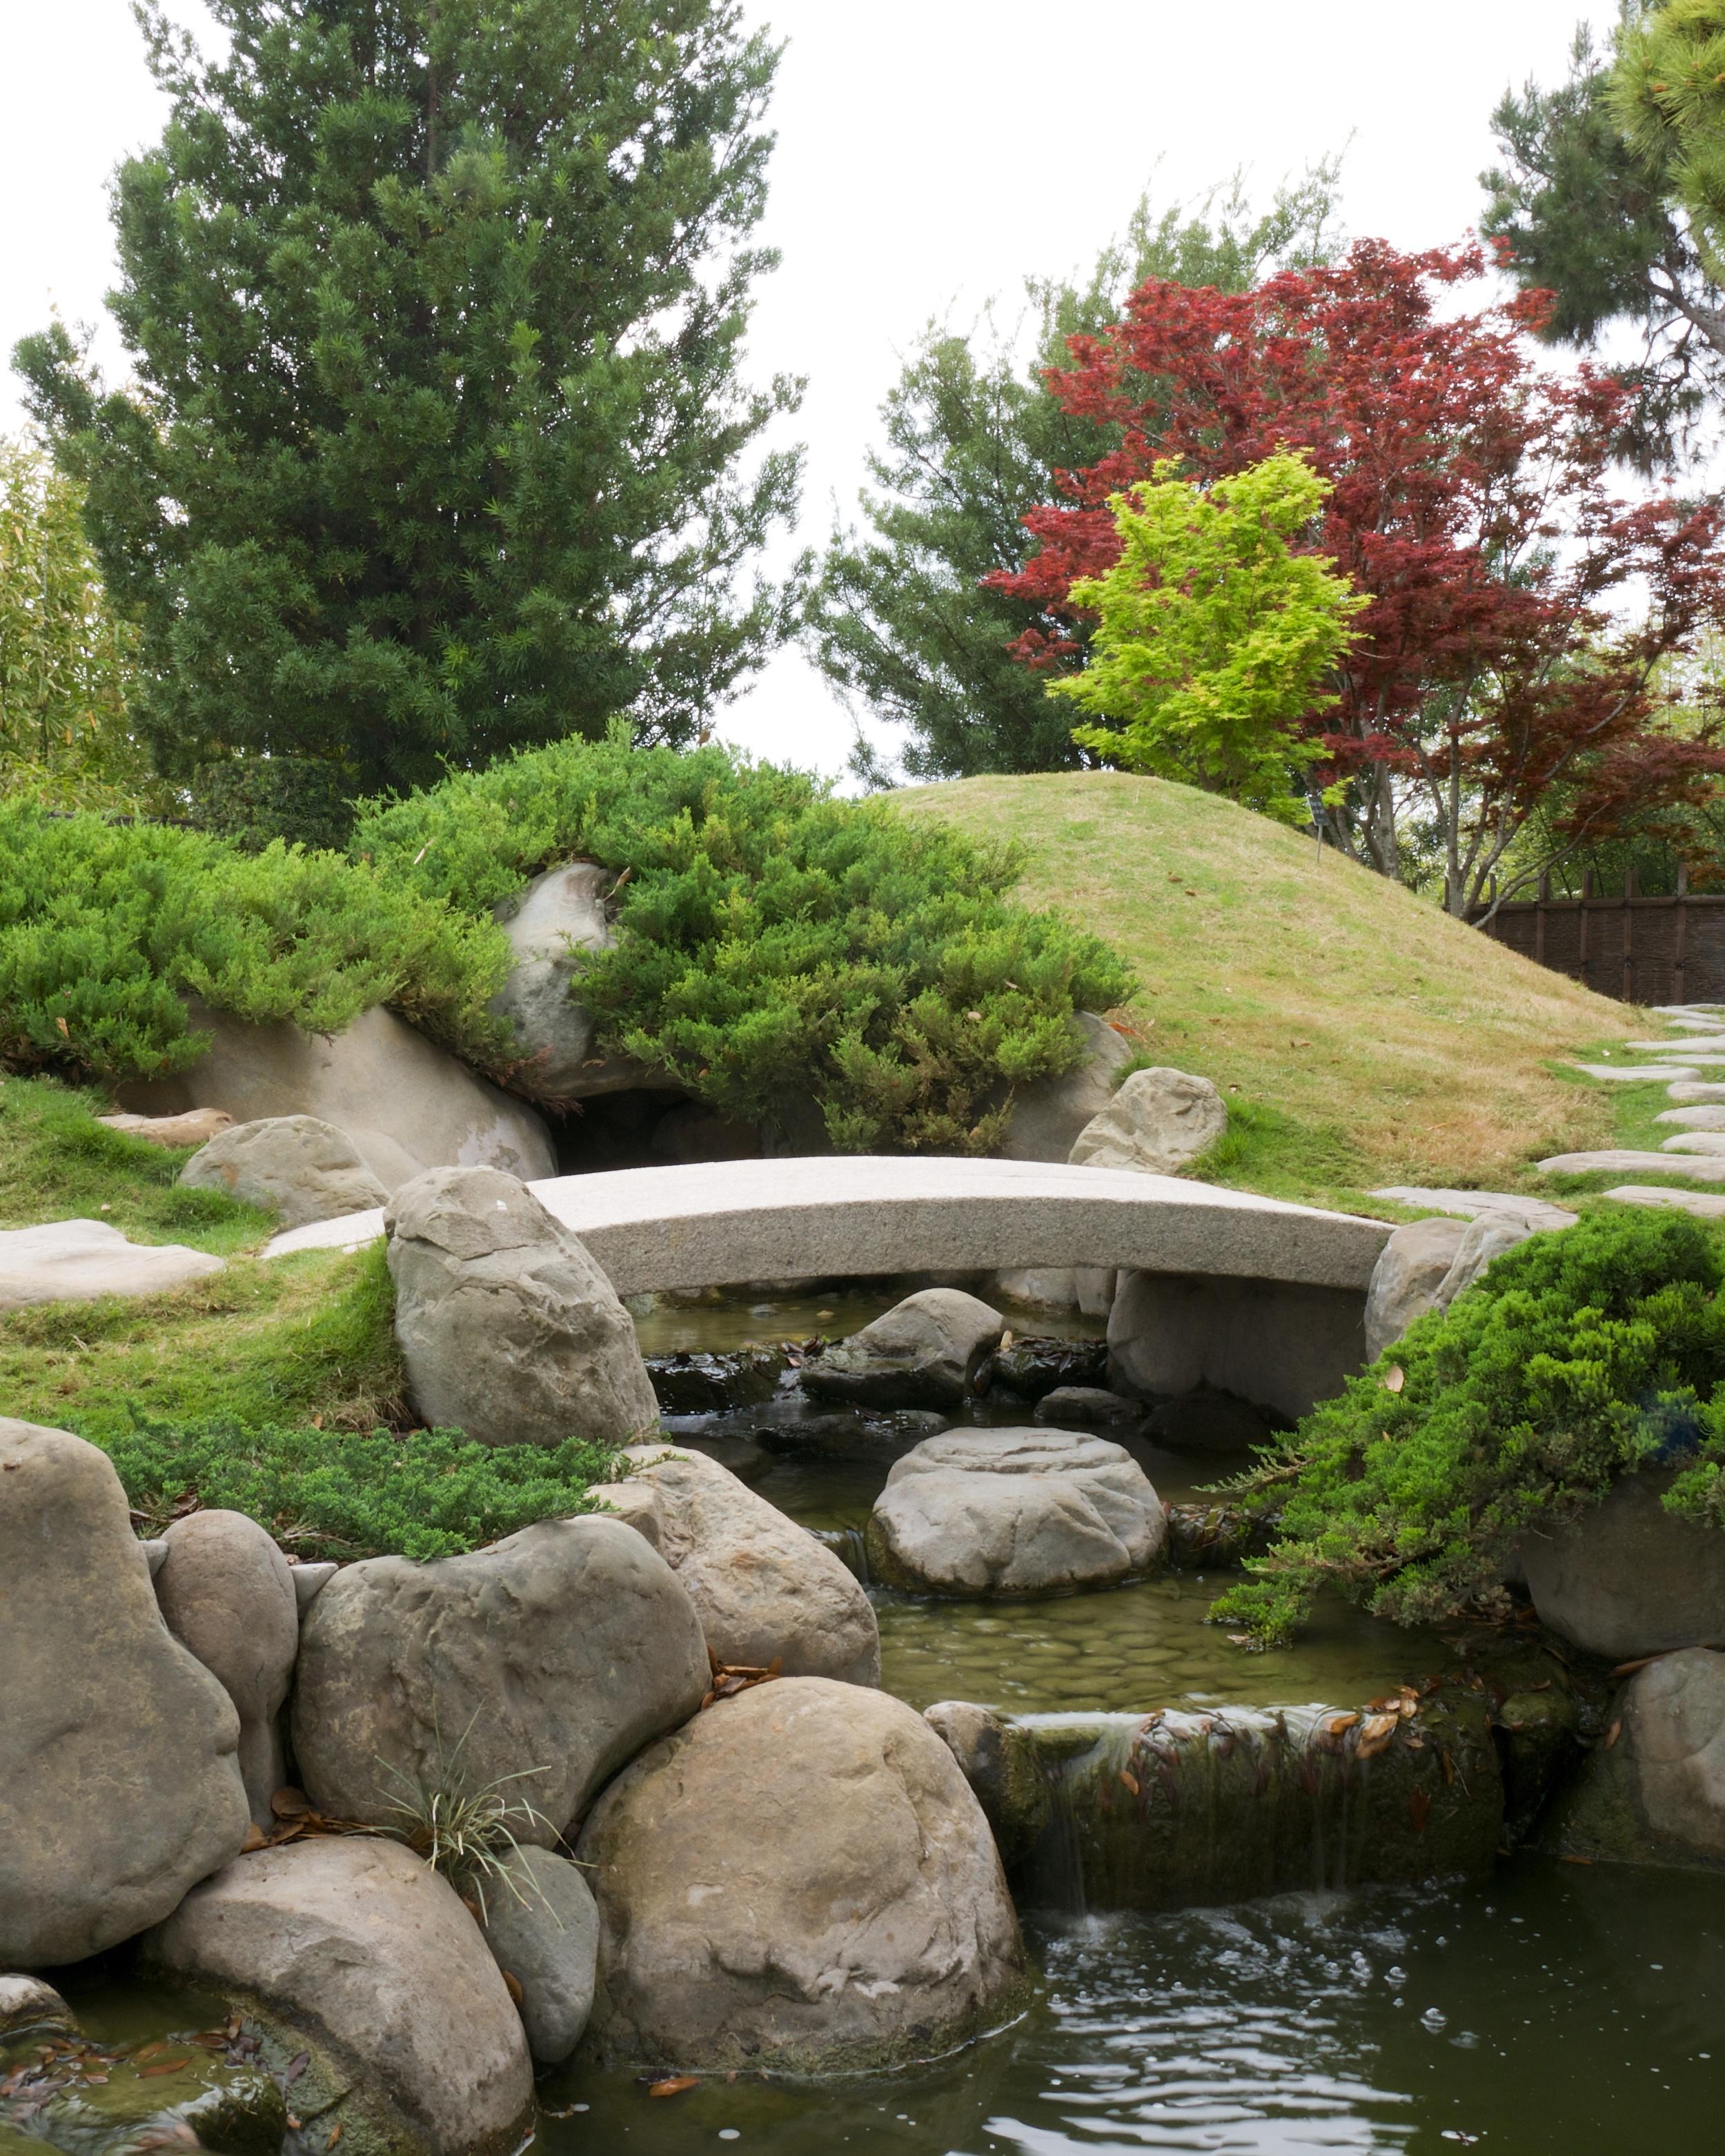 San Antonio Botanical Garden's Japanese garden